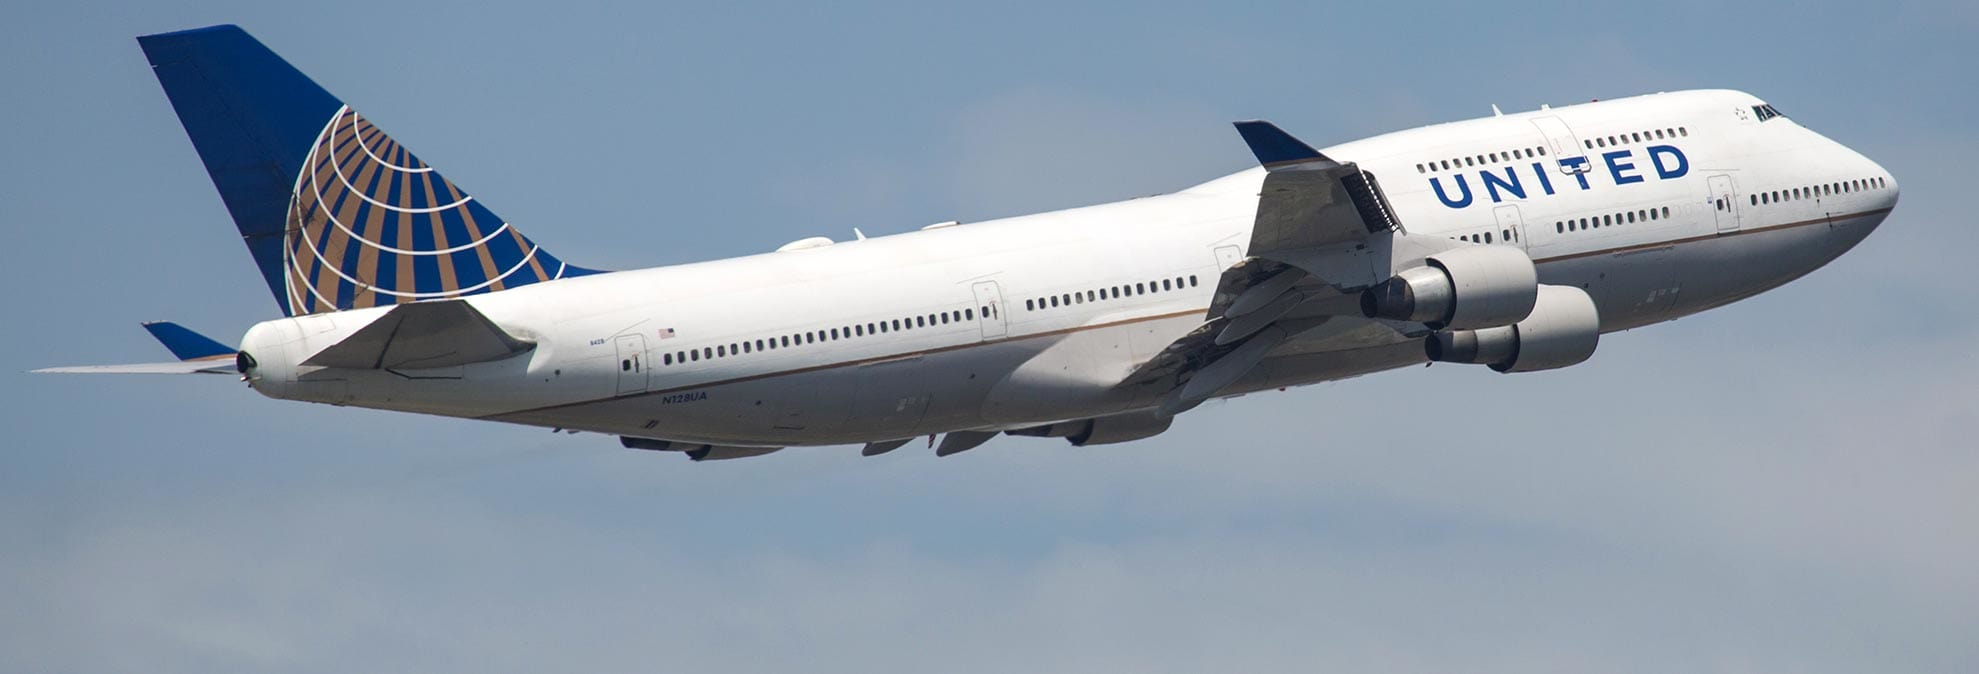 Air Travel Insurance Reviews